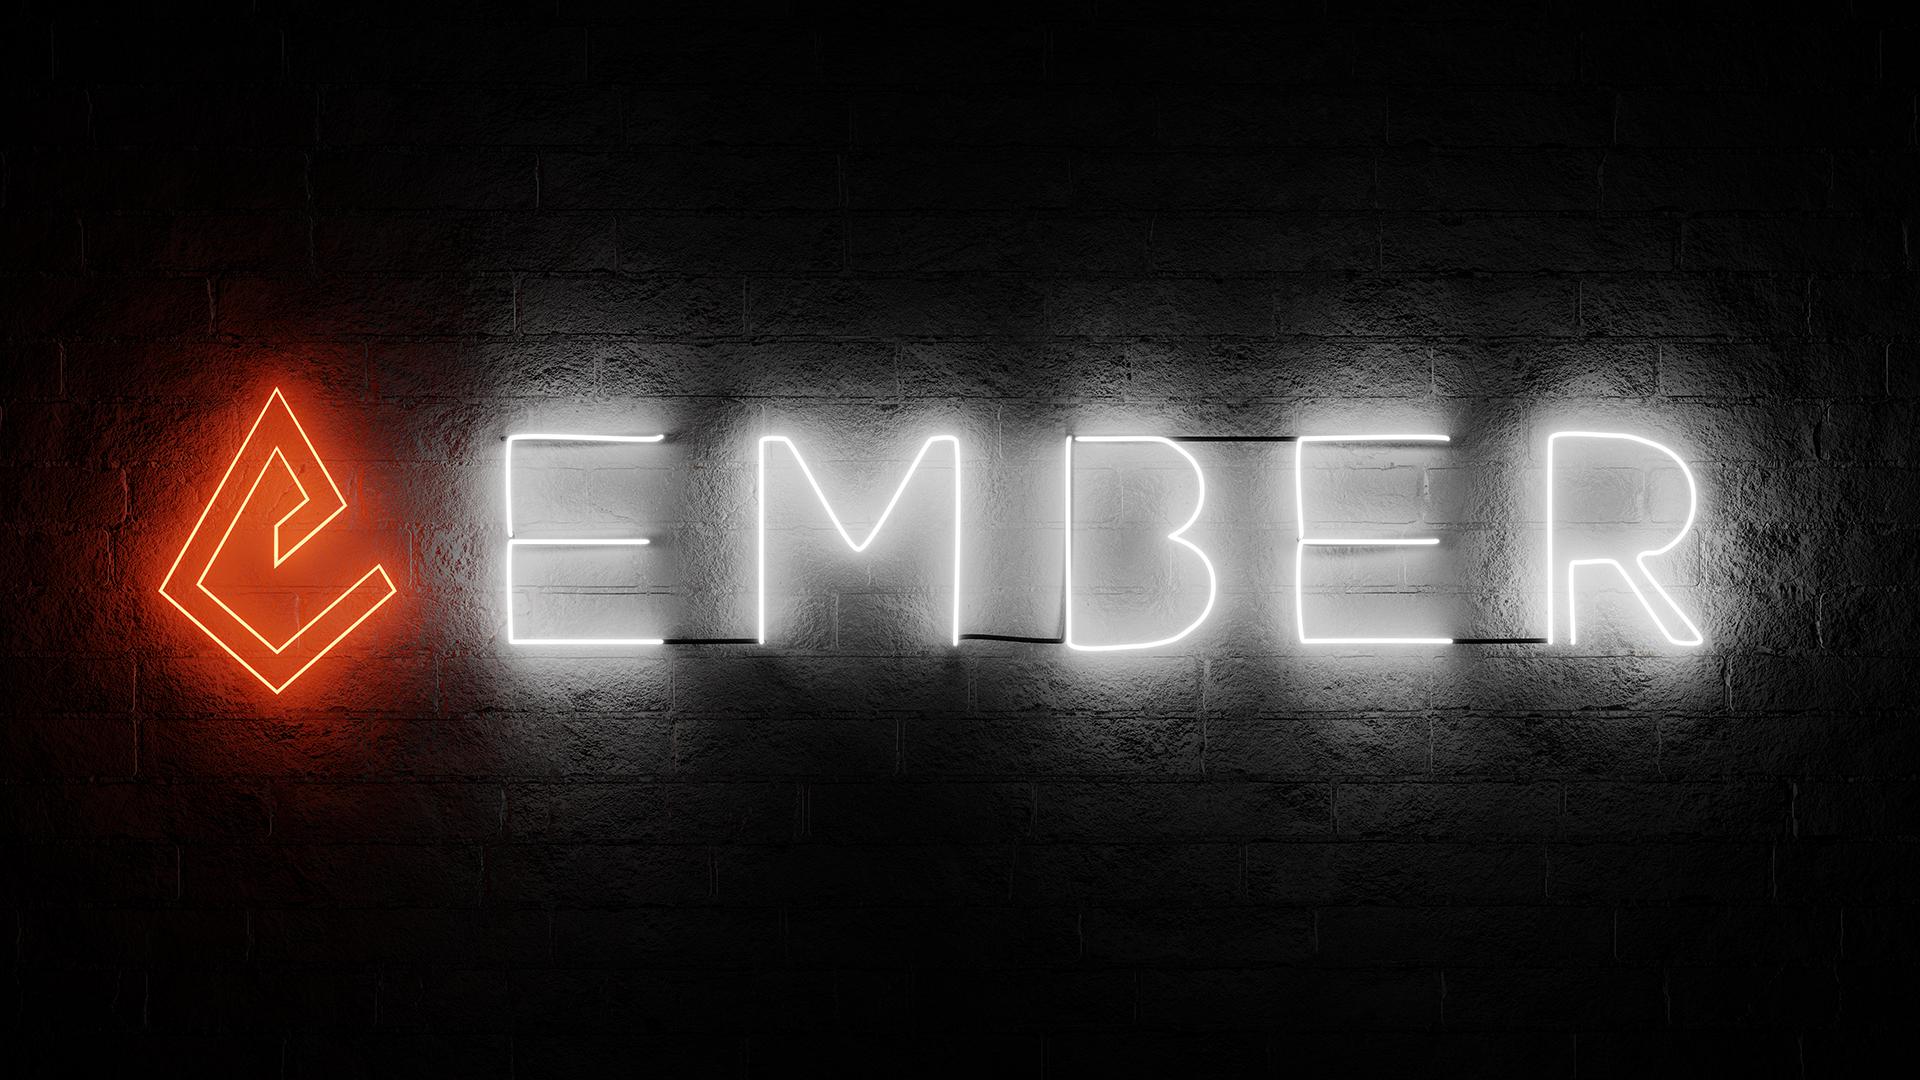 Ember_Neon_Sign_v001_1080p